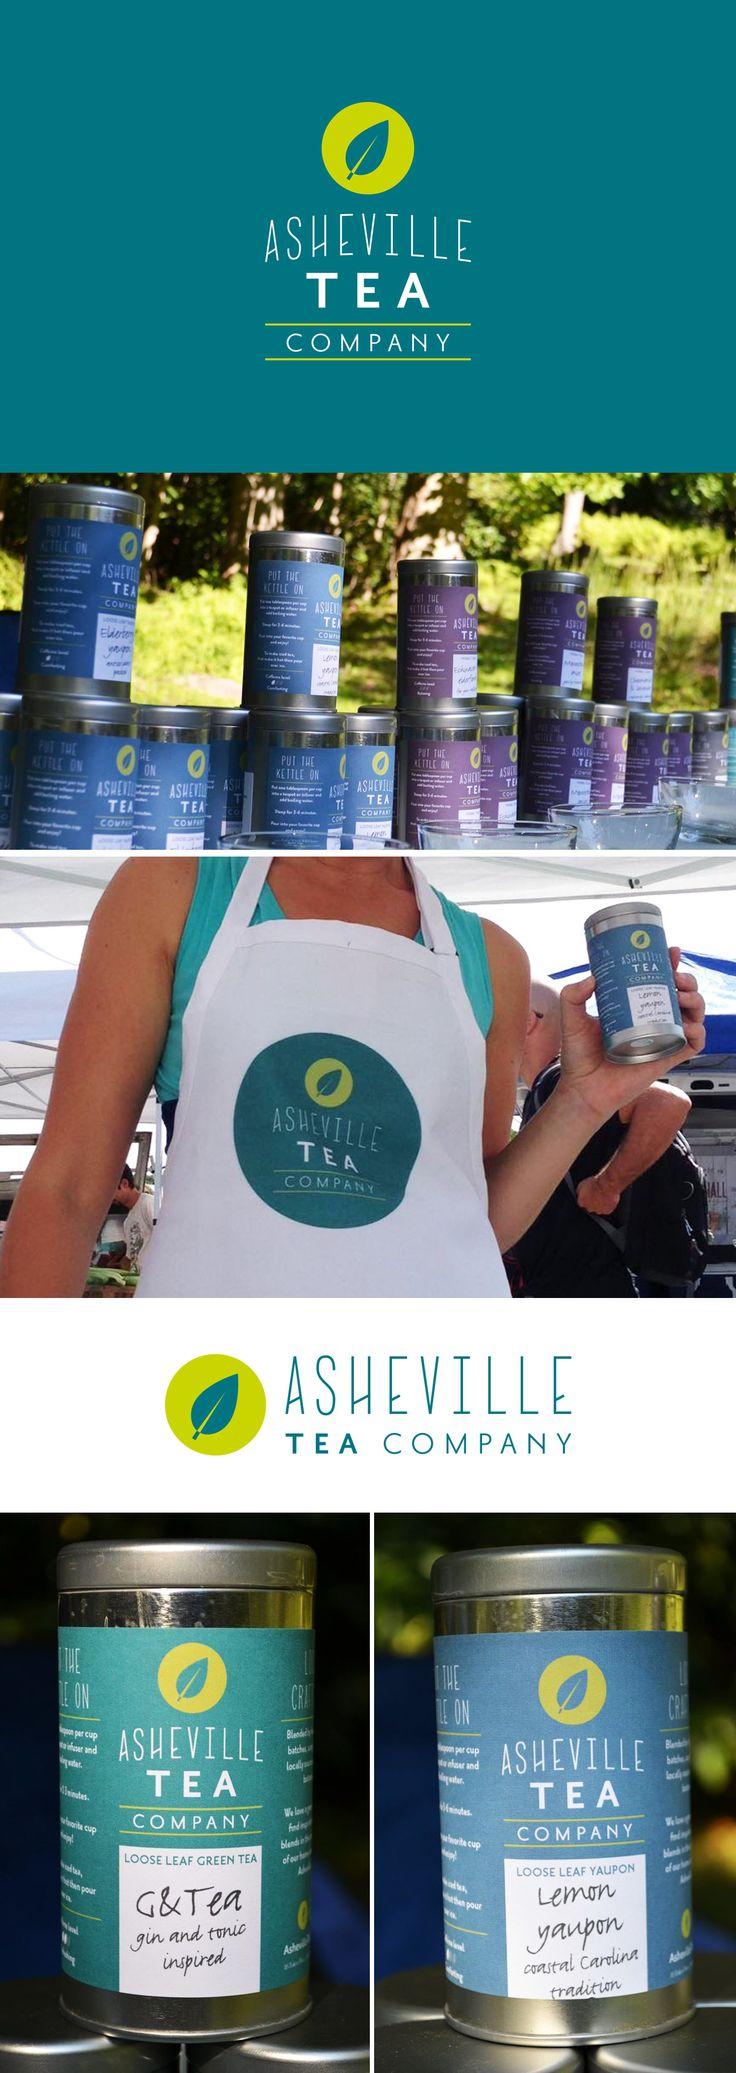 Asheville Tea Company logo design by Snow in July Designs.